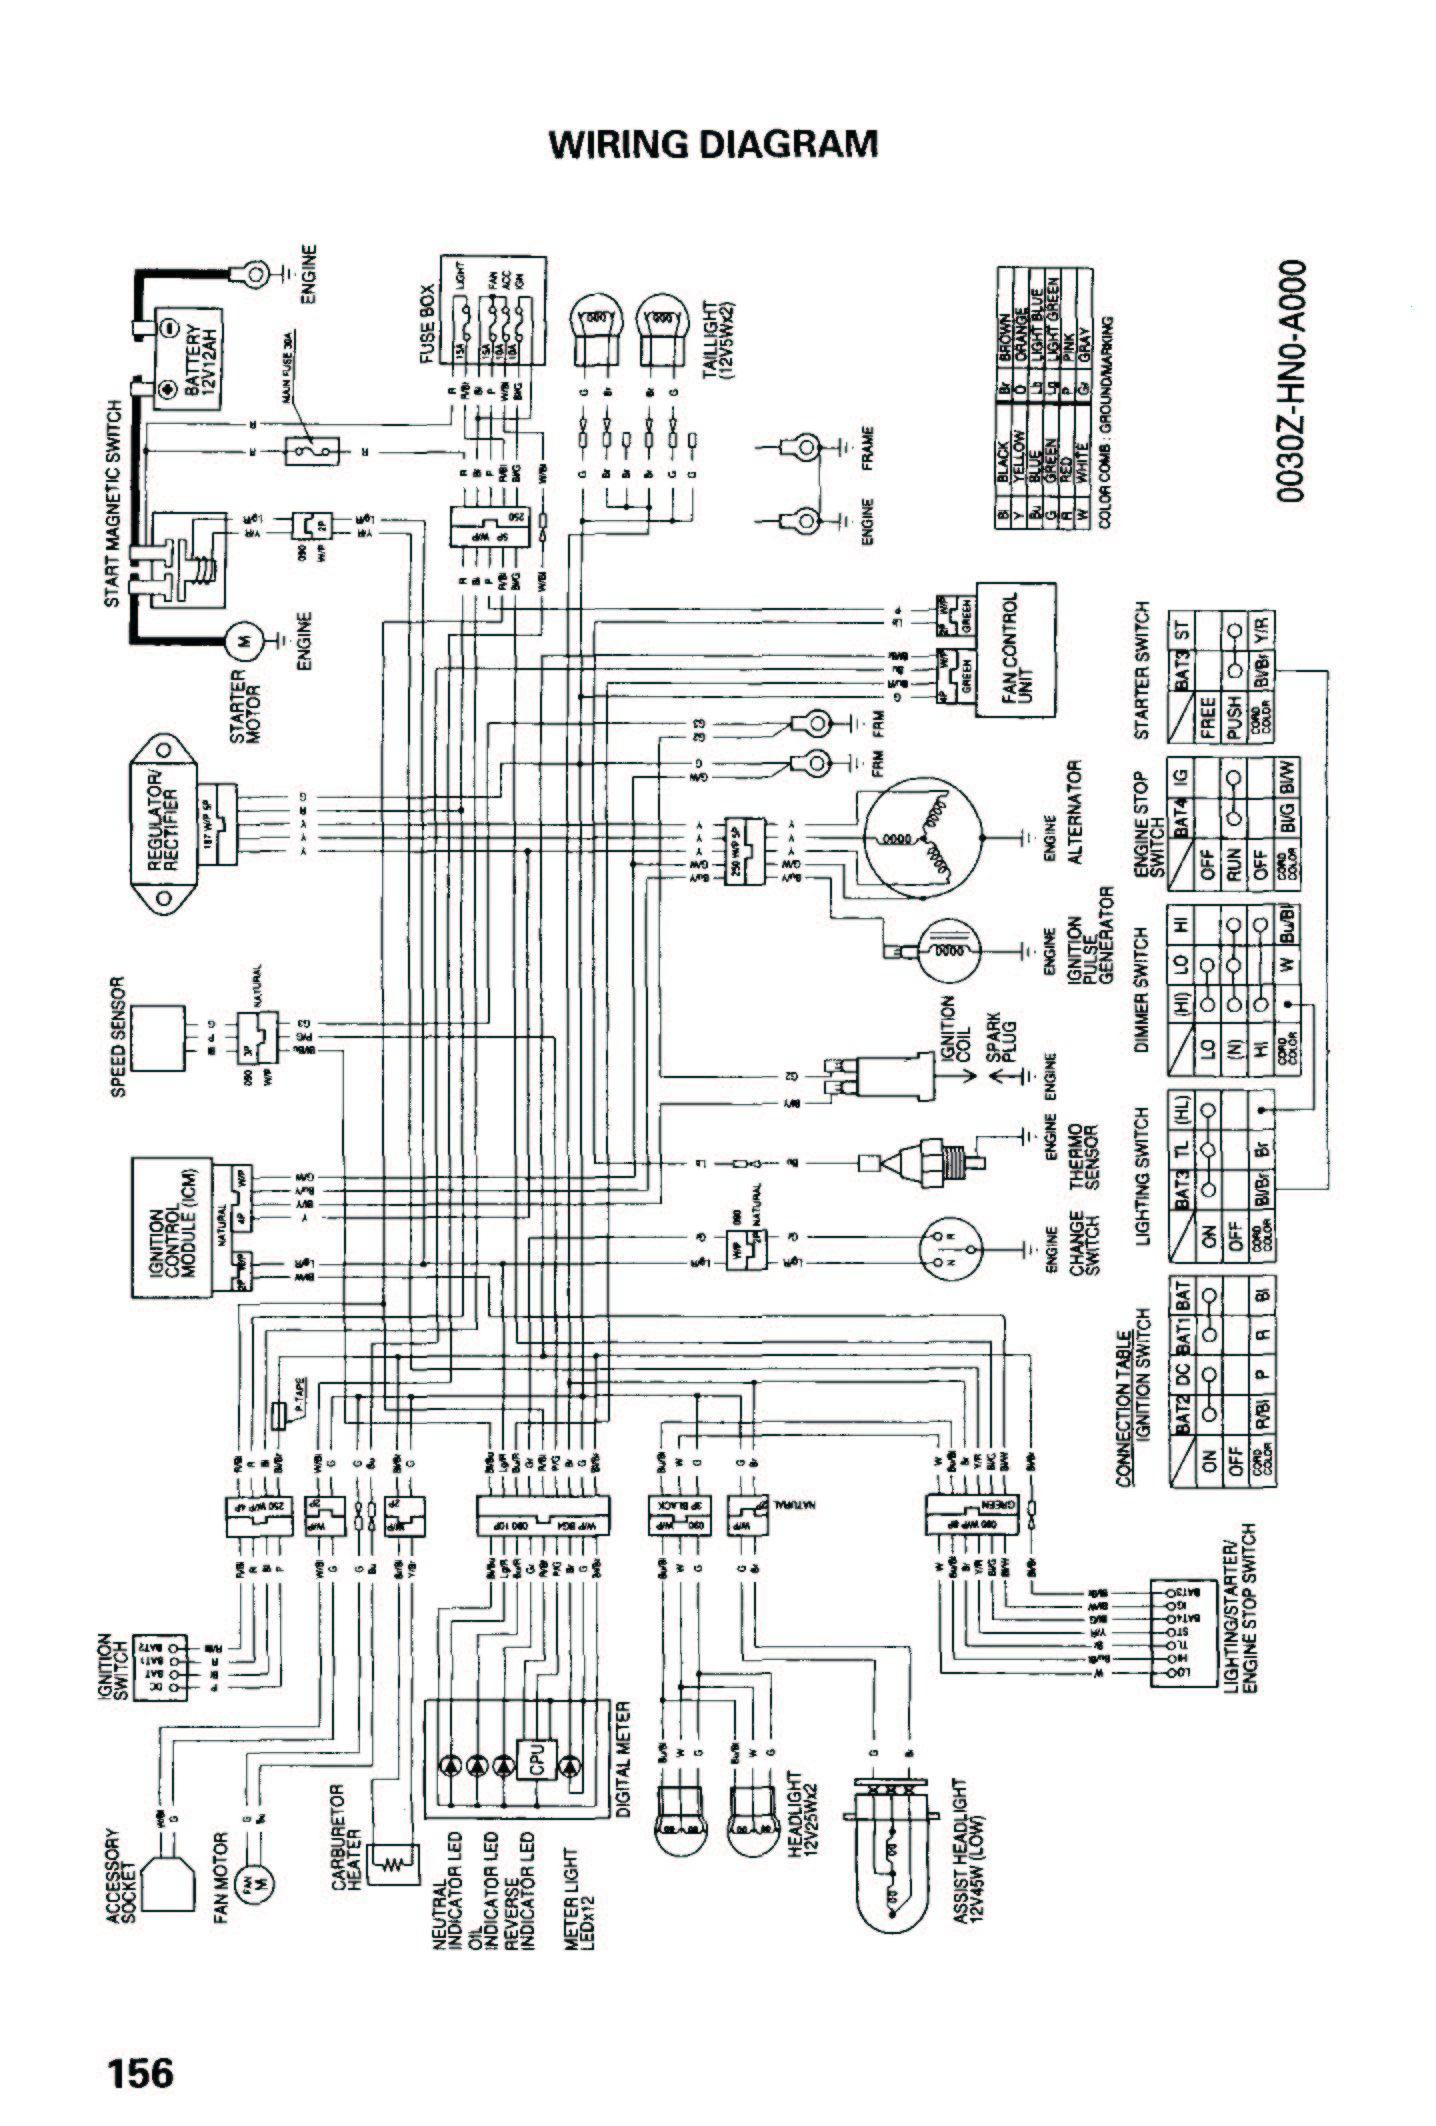 MT_0225] Wiring Diagram For Honda Rubicon Schematic WiringBupi Zidur Rele Mohammedshrine Librar Wiring 101